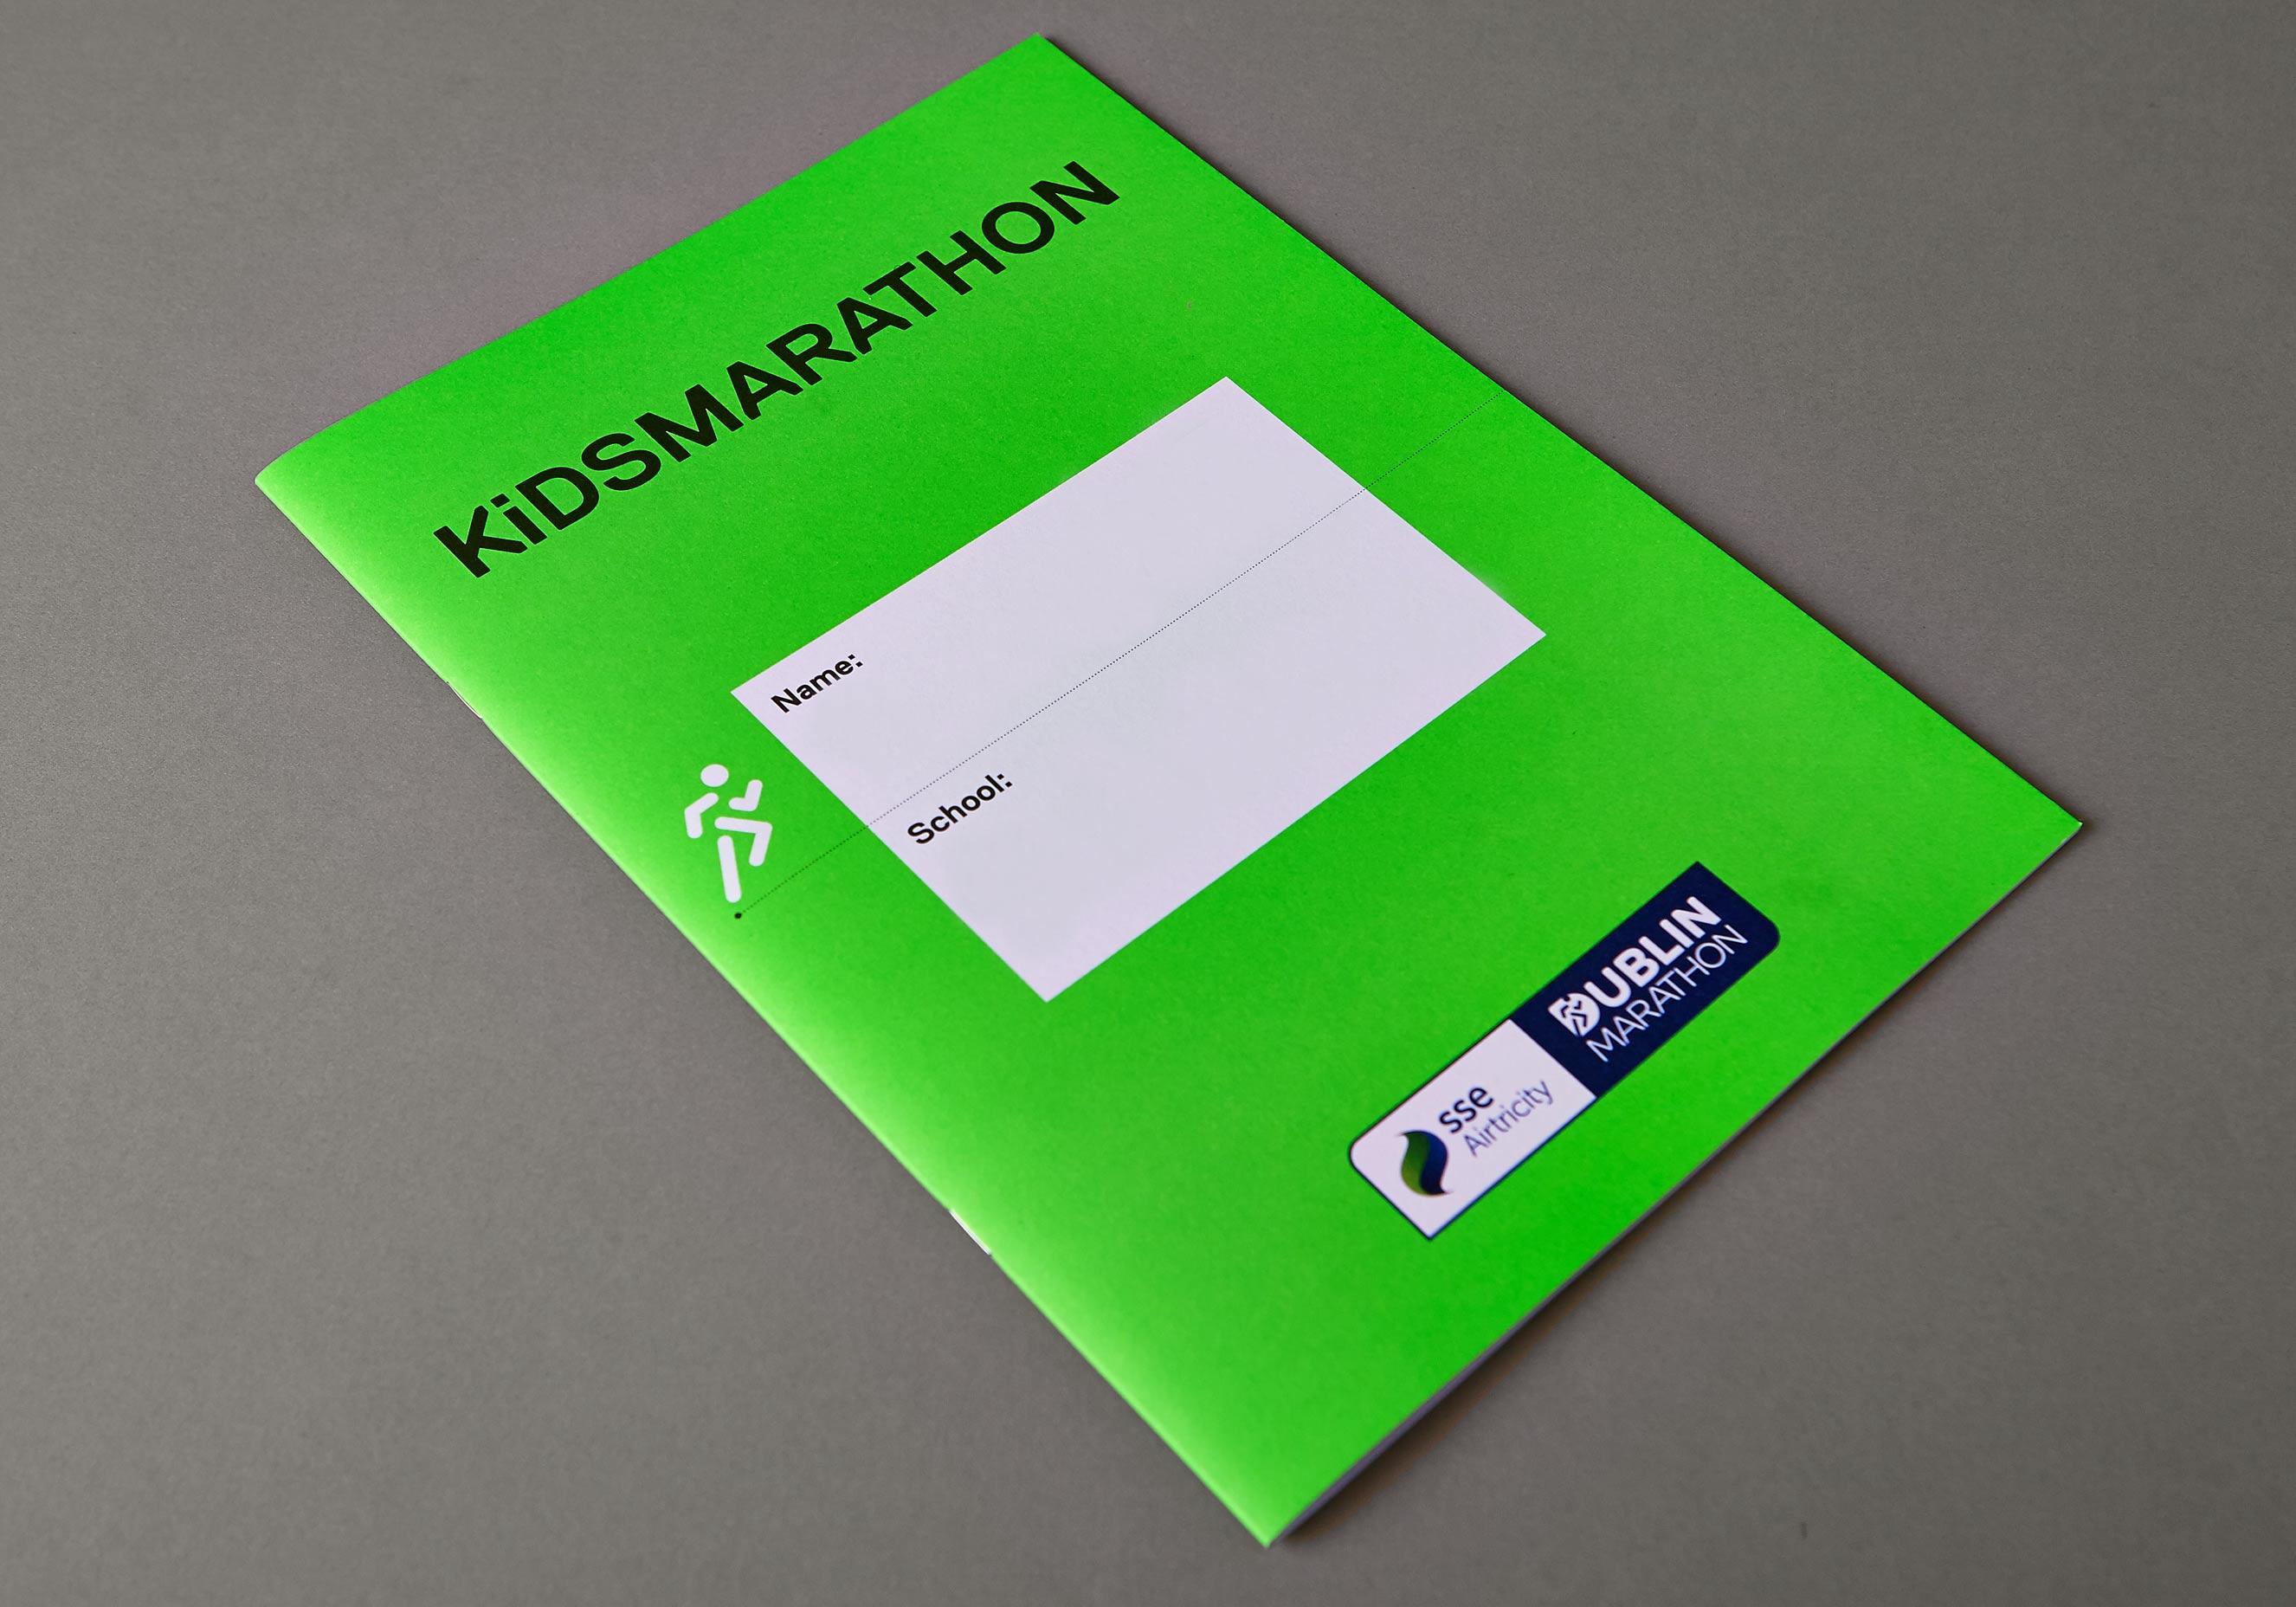 Cover image: KiDSMARATHON (2015)